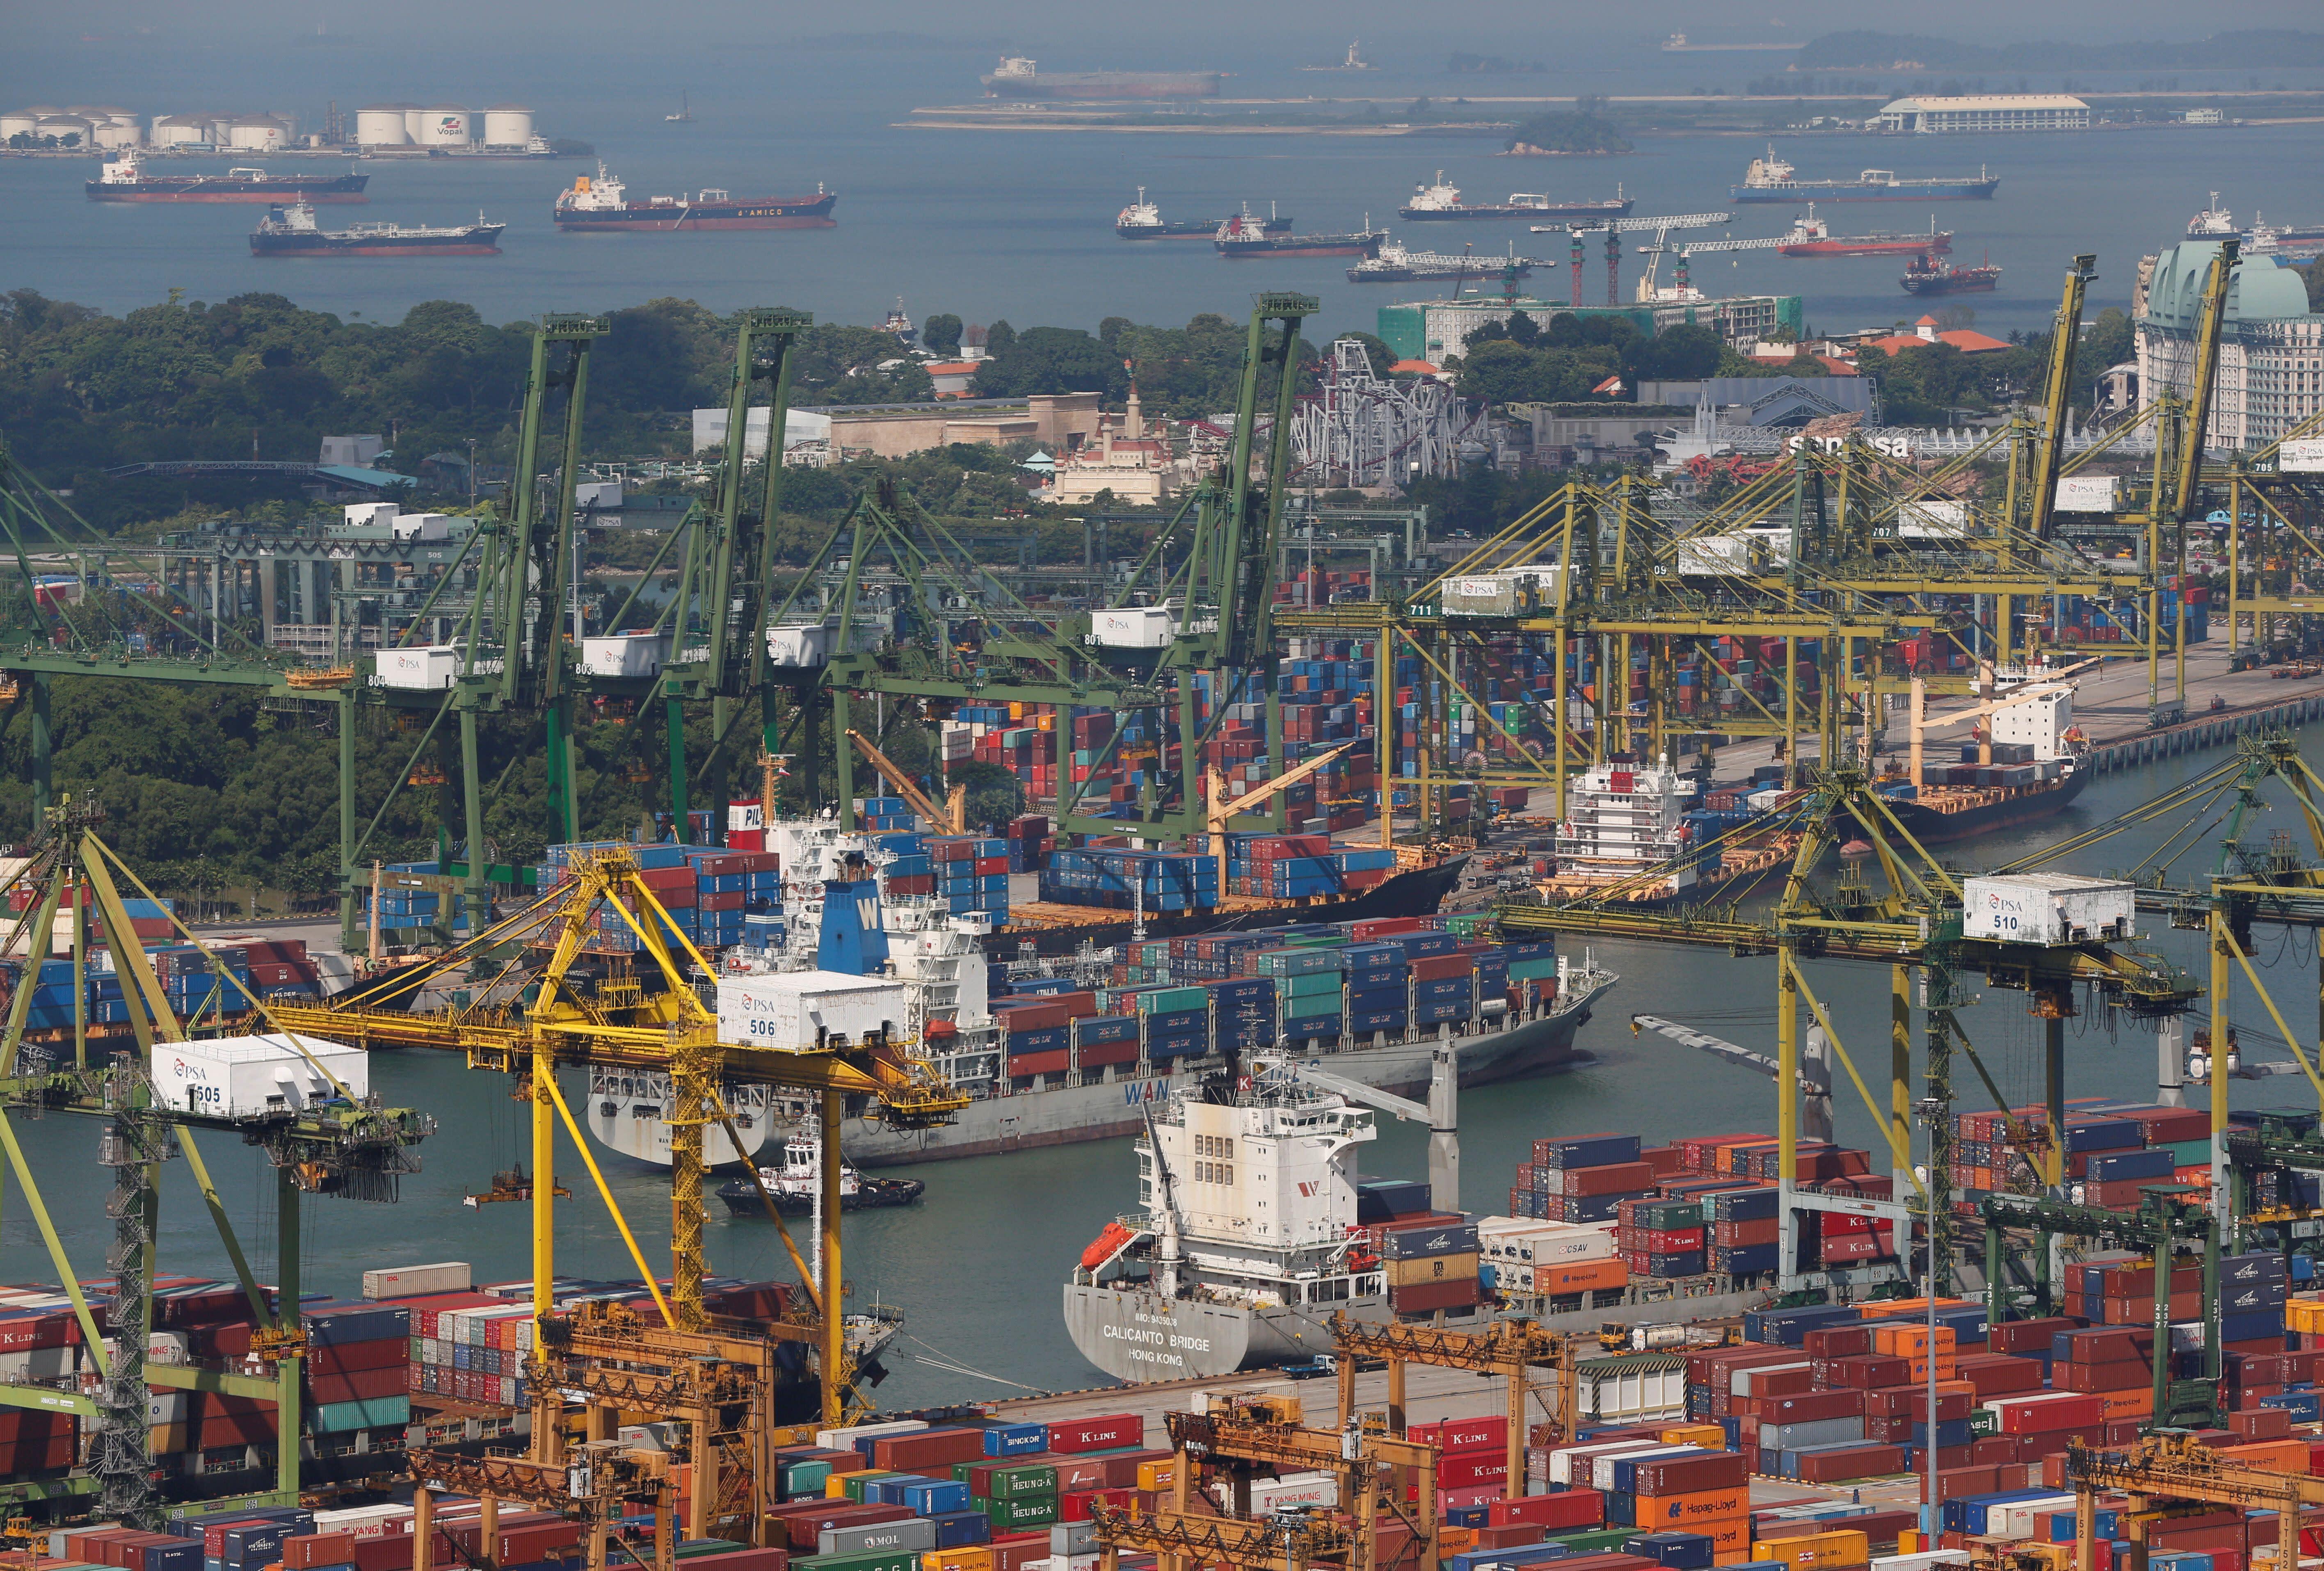 KKR said to explore US$2 billion sale of Singapore's Goodpack